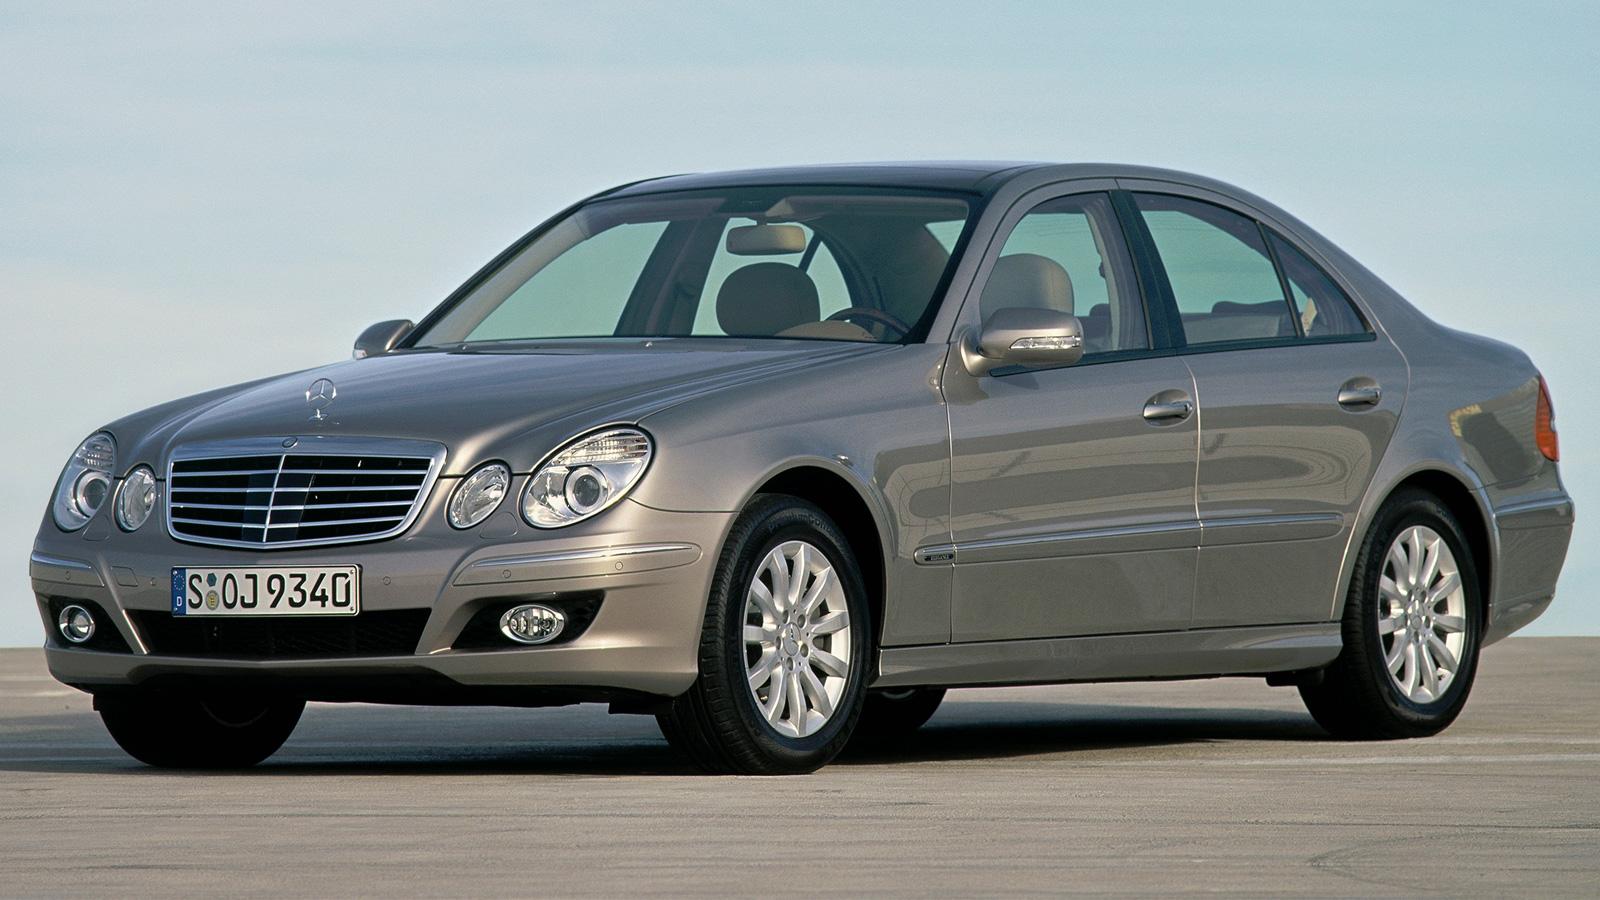 Mercedes Benz E Class W211 технические характеристики обзор и фотографии